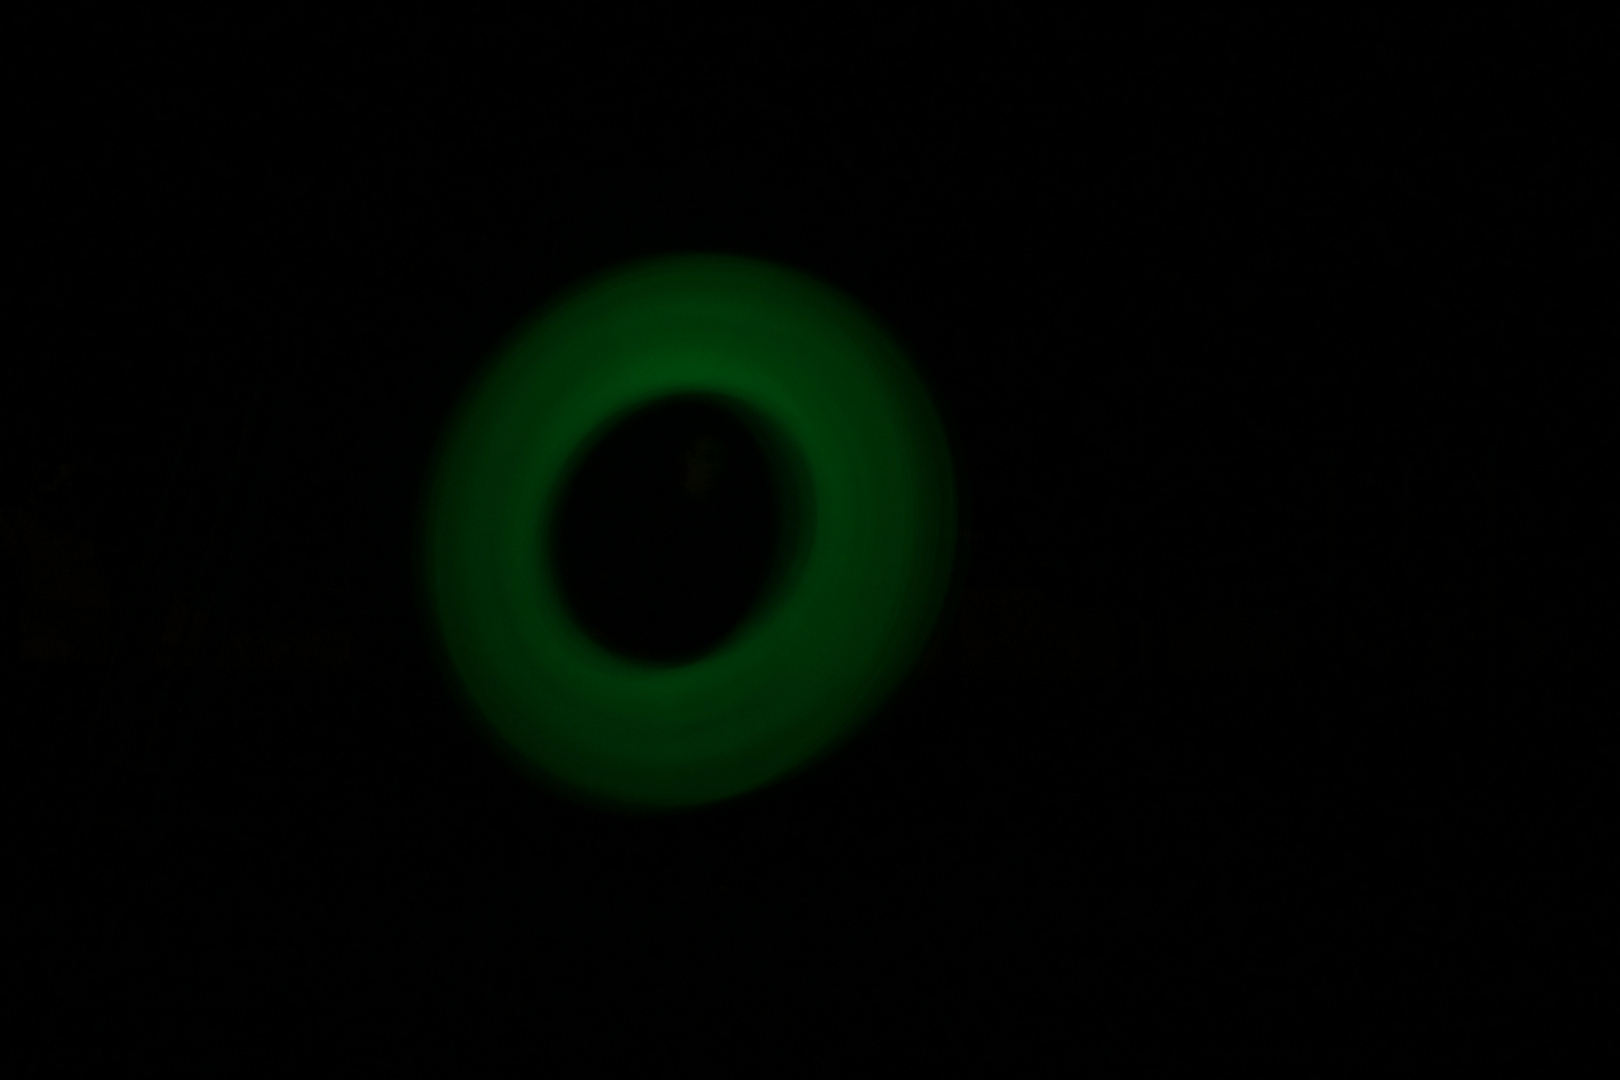 green cirkel